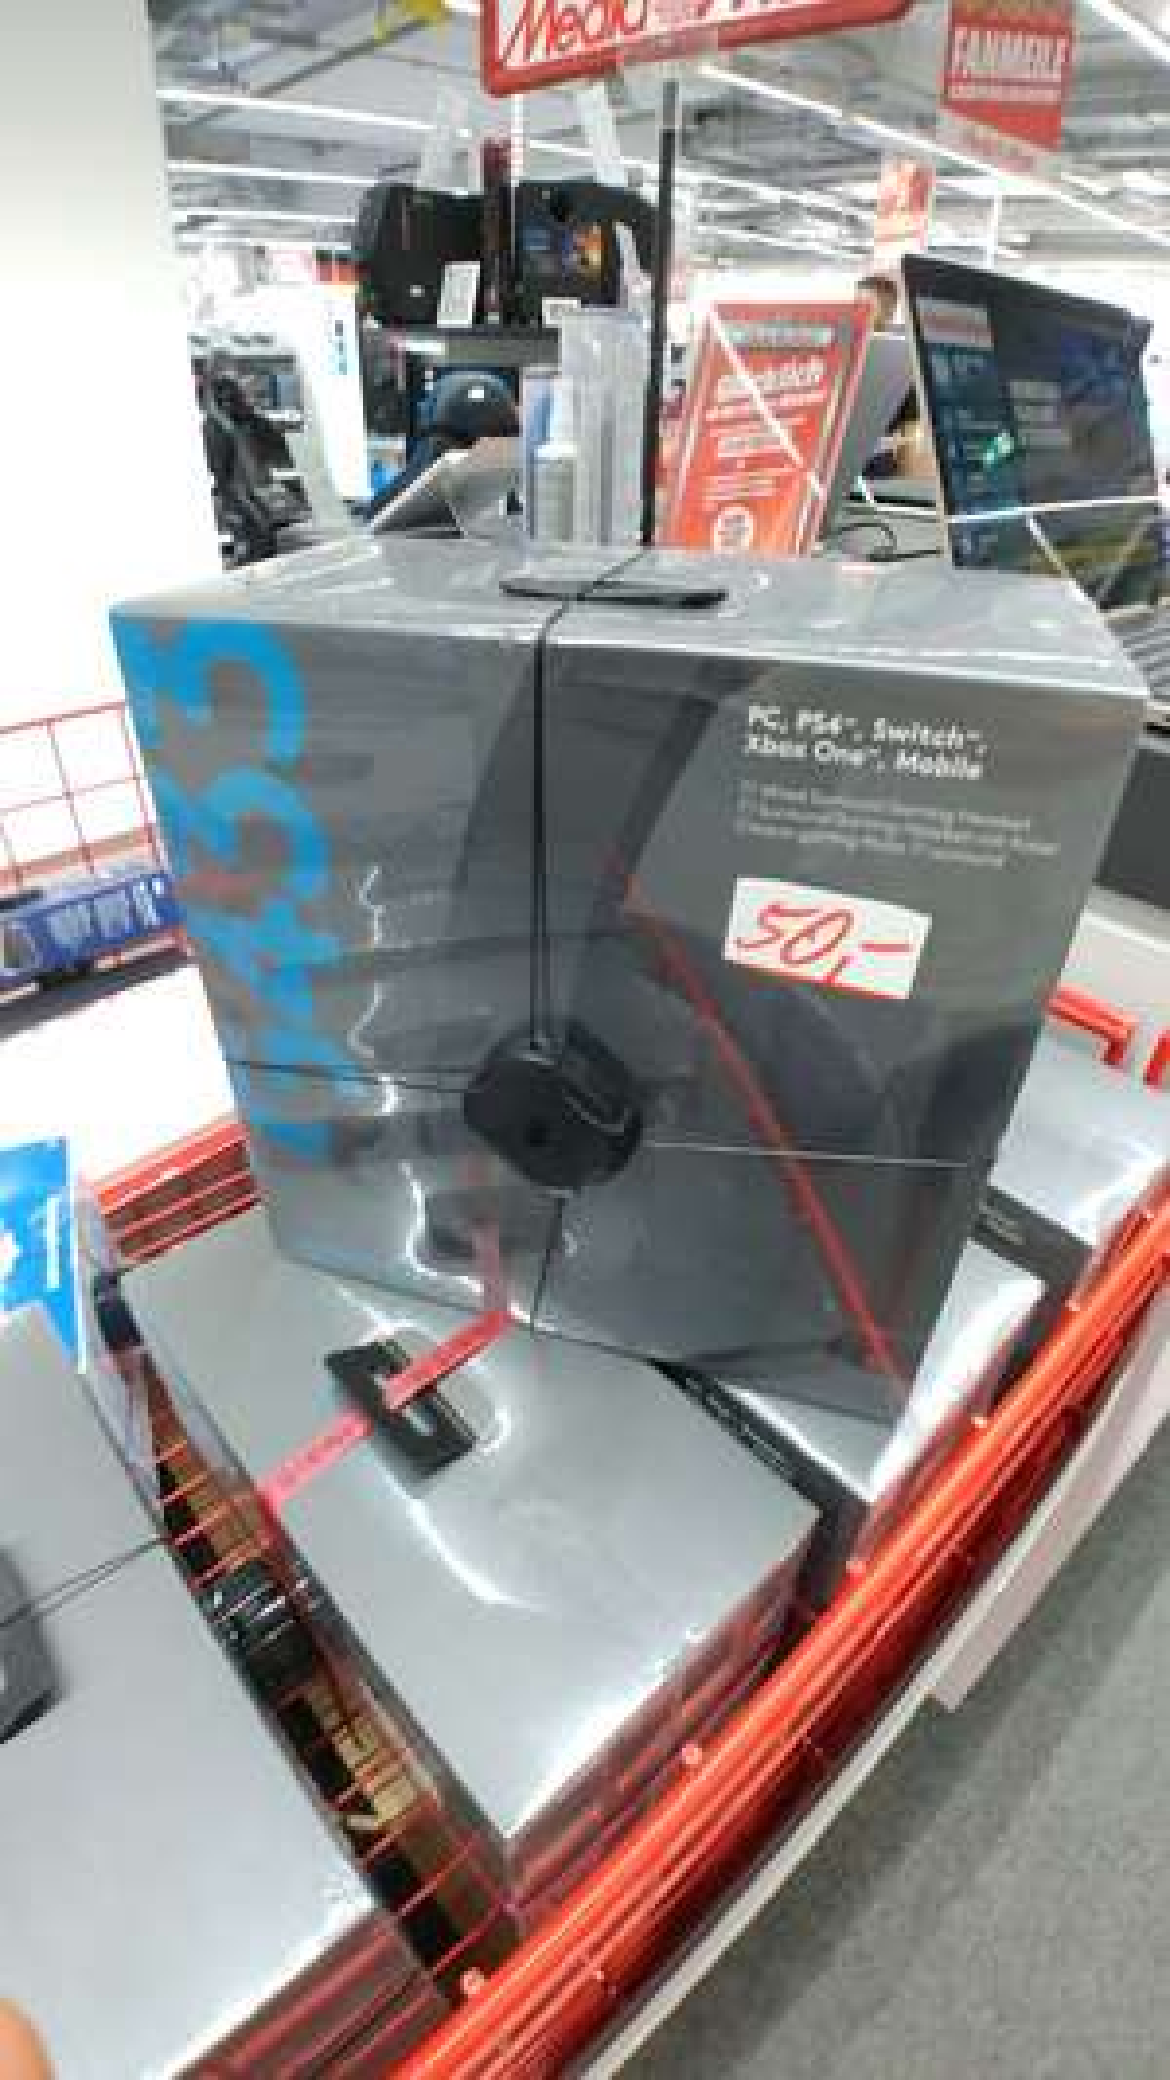 Logitech G433 Media Markt Lokal Dresden Abverkauf Centrum-Galerie 50 Euro Gaming Headset